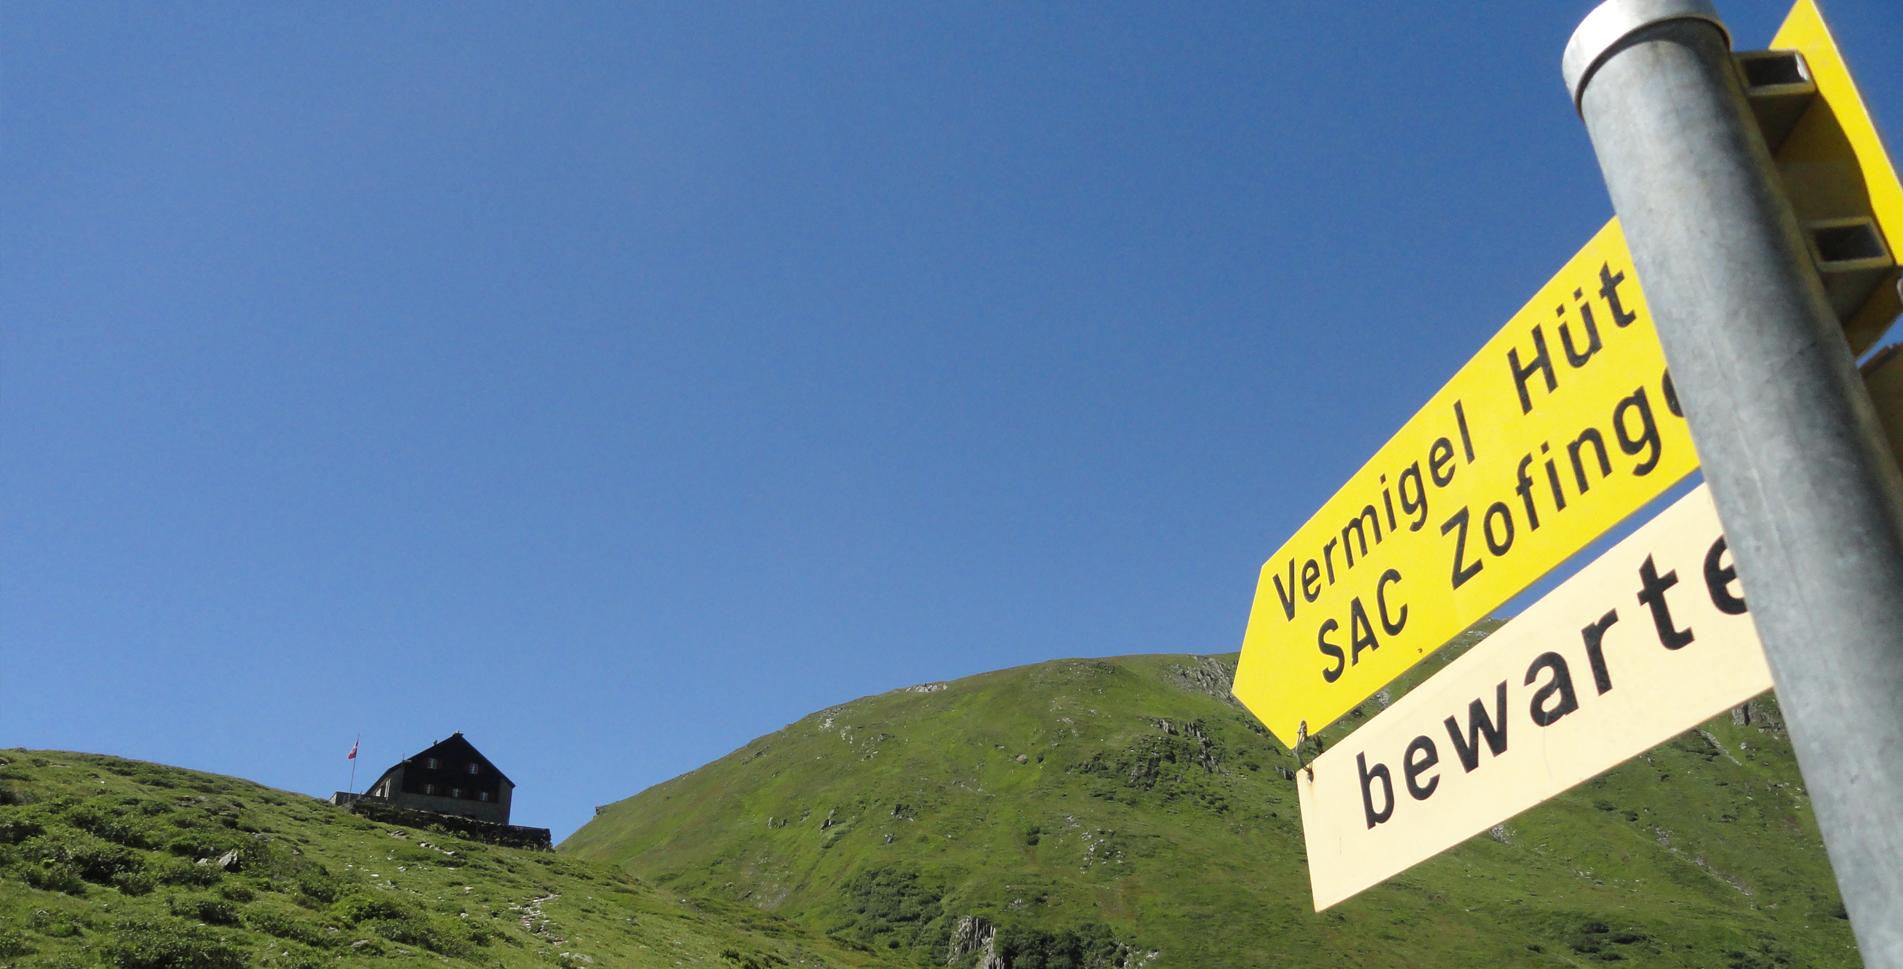 Andermatt – Vermigelhütte – Maighelspass – Val Maighels – Passo Bornengo – Capanna Cadlimo – Capanna Cadagno – Lago Ritom – Piora